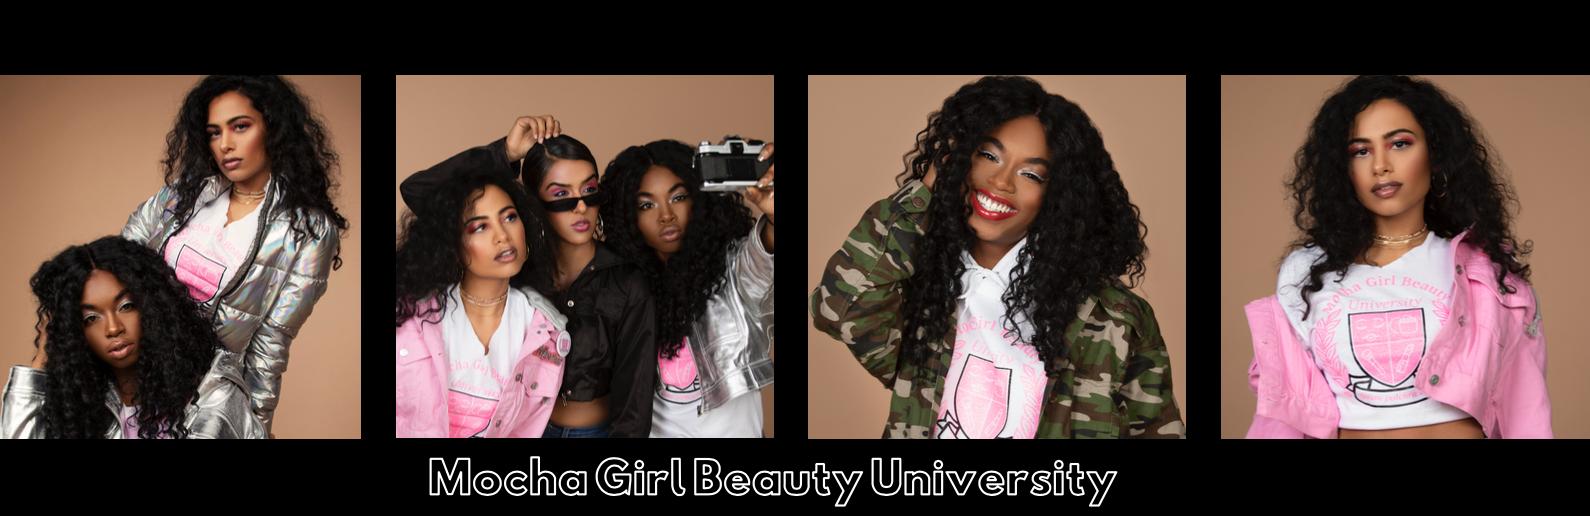 Mocha Girl Beauty University Ambassador Program